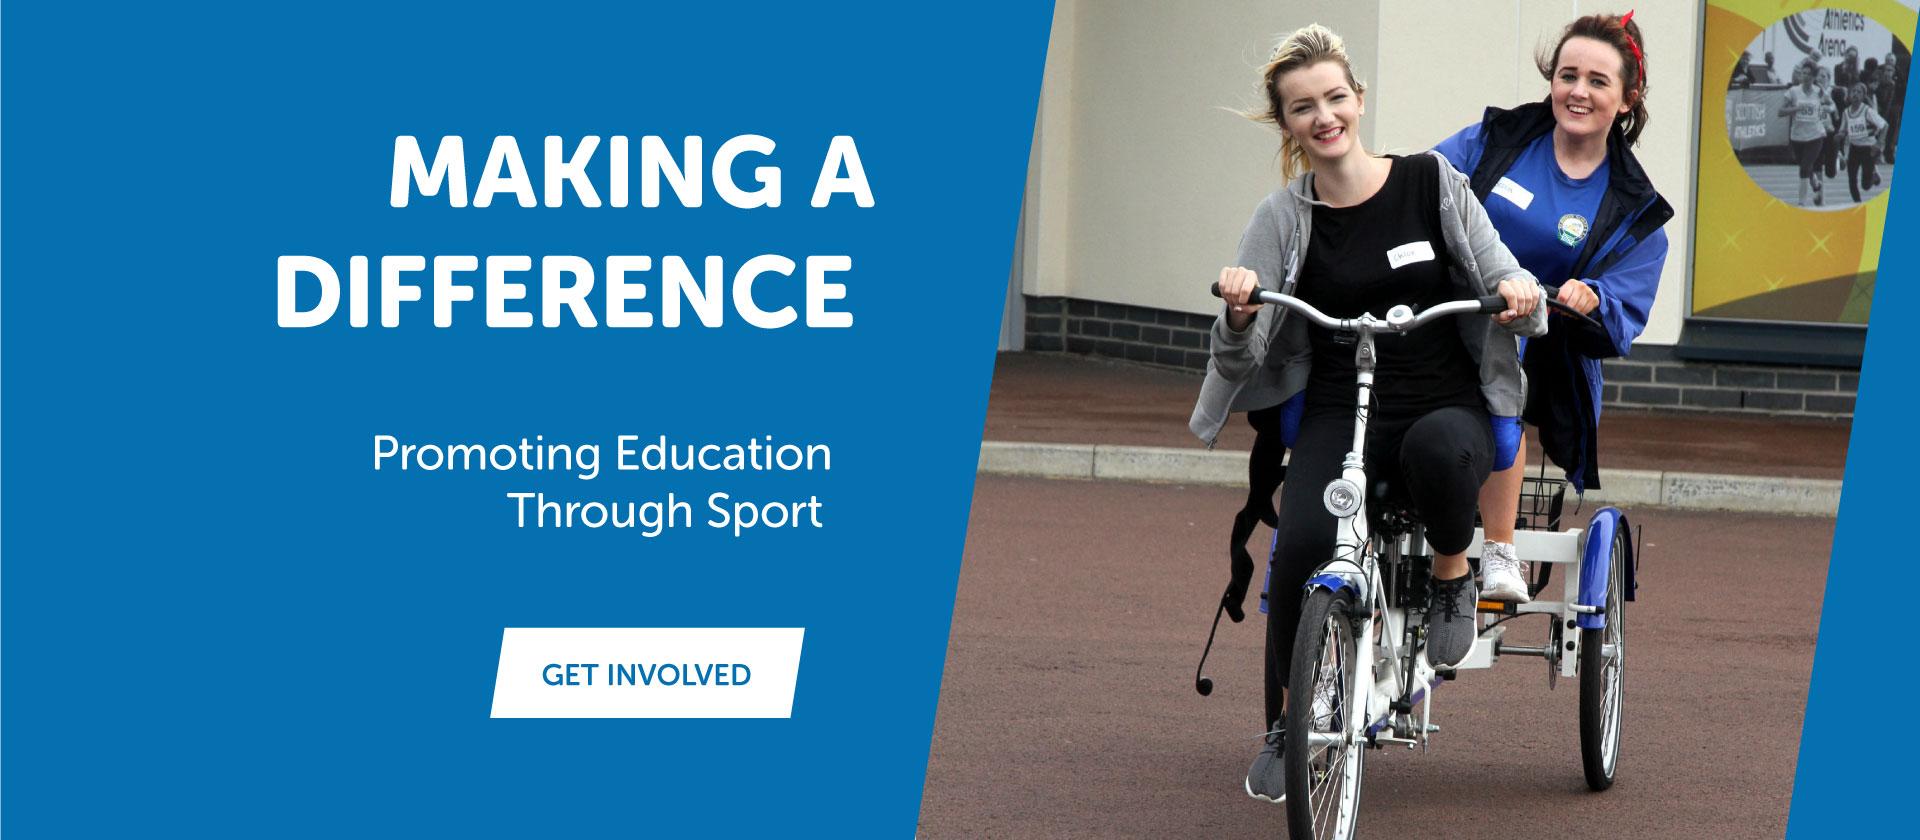 Promoting Education Through Sport